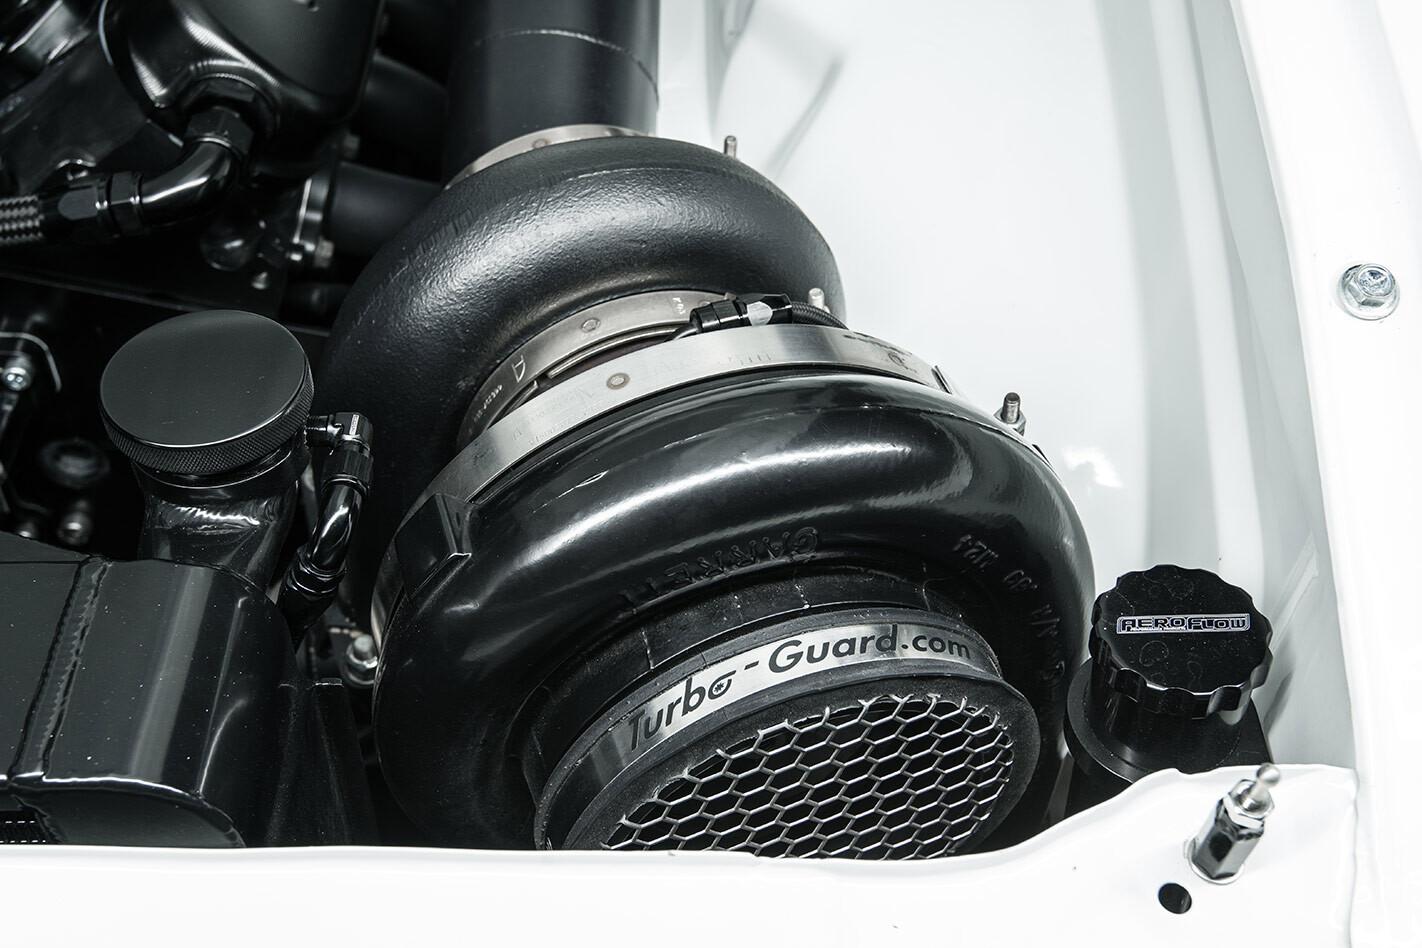 Holden LX Torana turbo